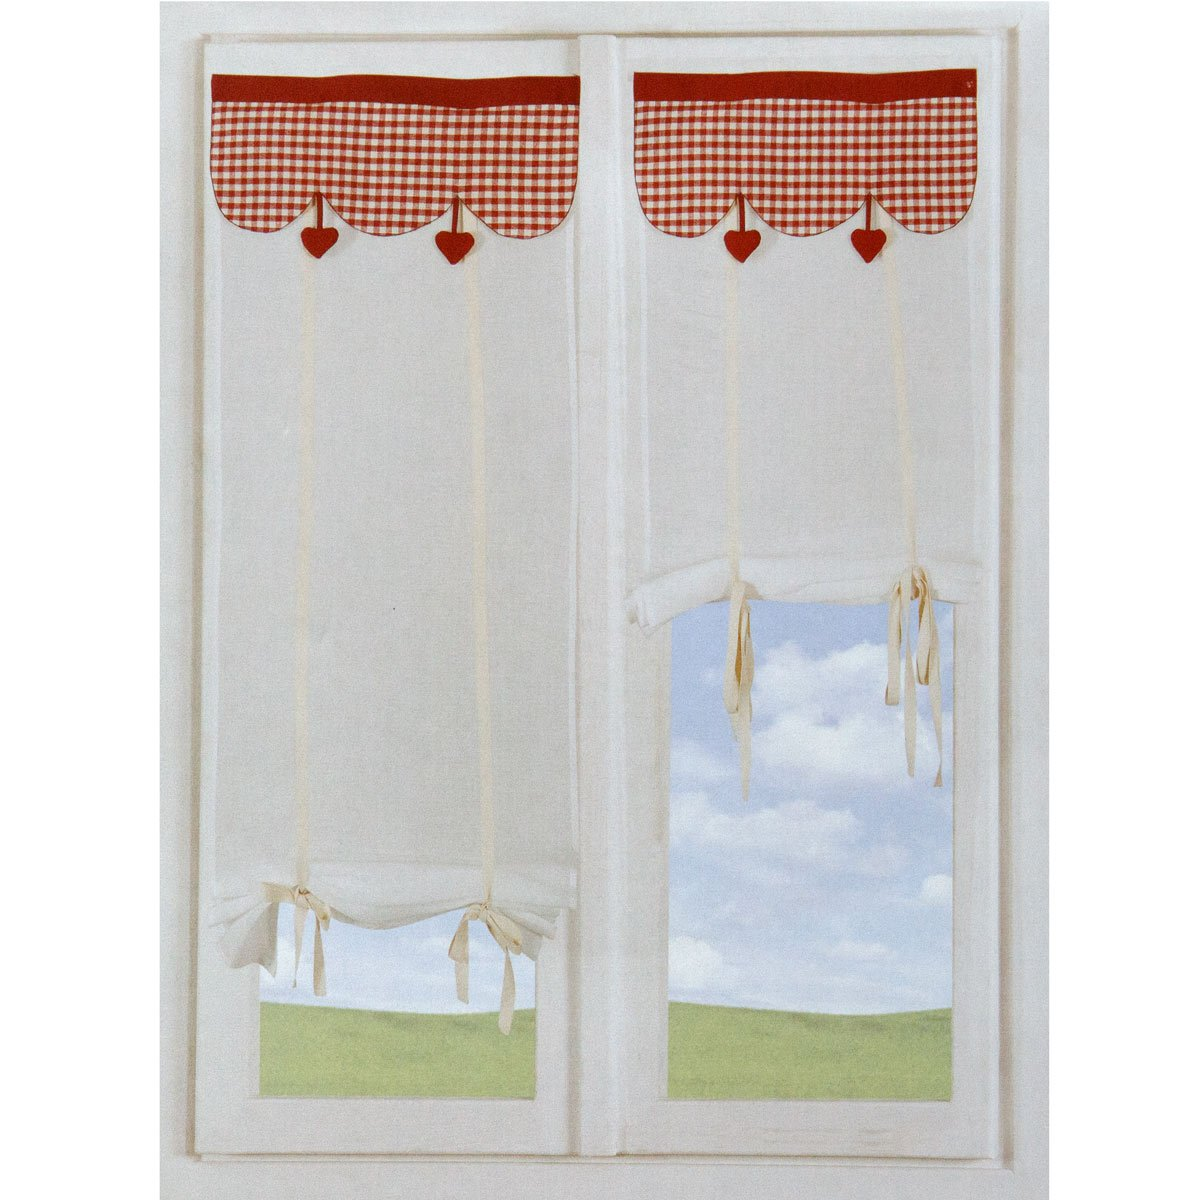 Coppia Tende tendine regolabili vetro finestra 60x230 cm Wendy M378 ...